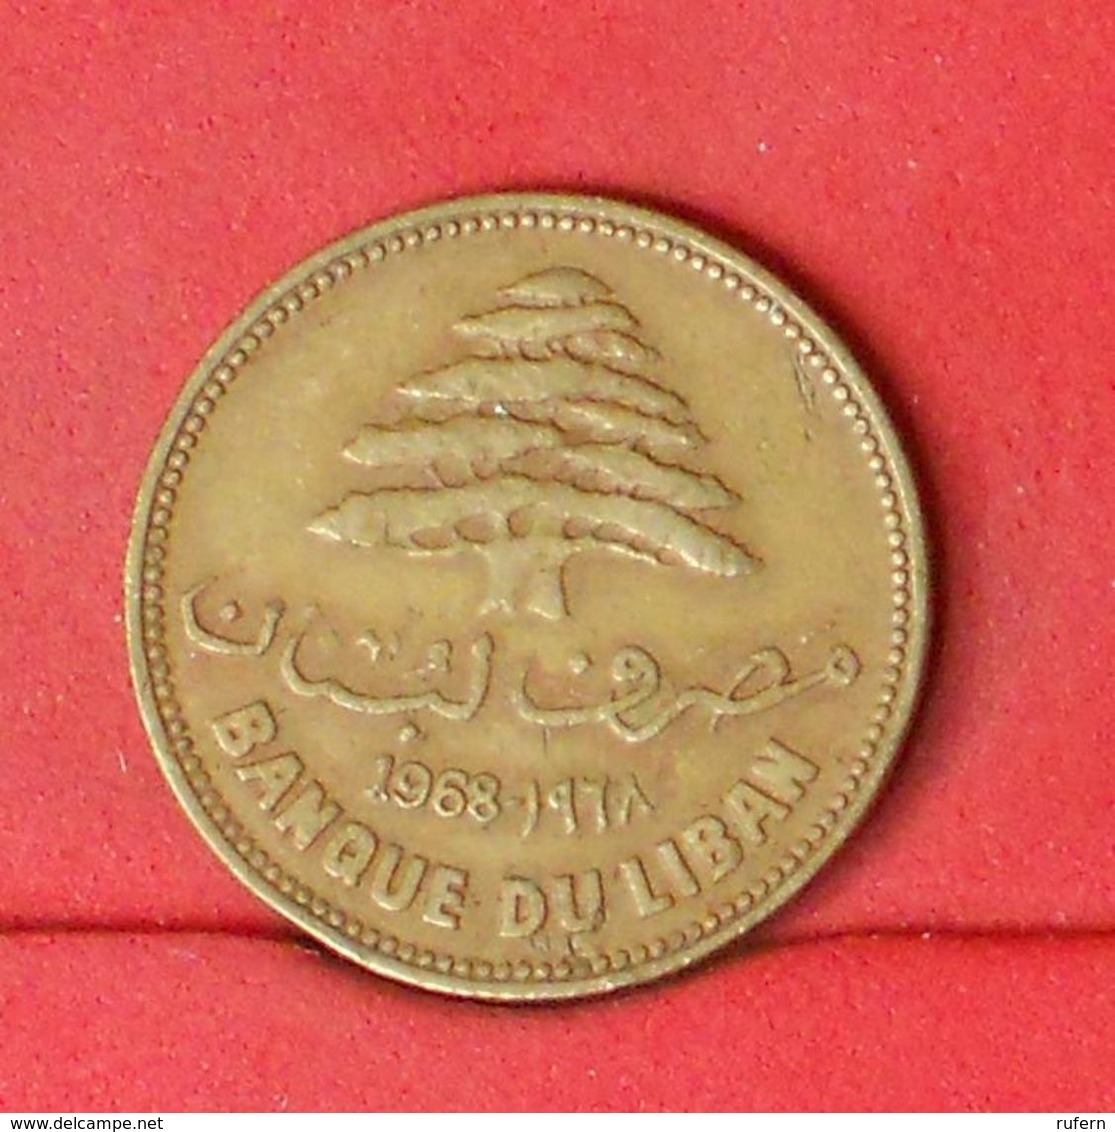 LEBANON 25 PIASTRES 1968 -    KM# 27,1 - (Nº20306) - Liban